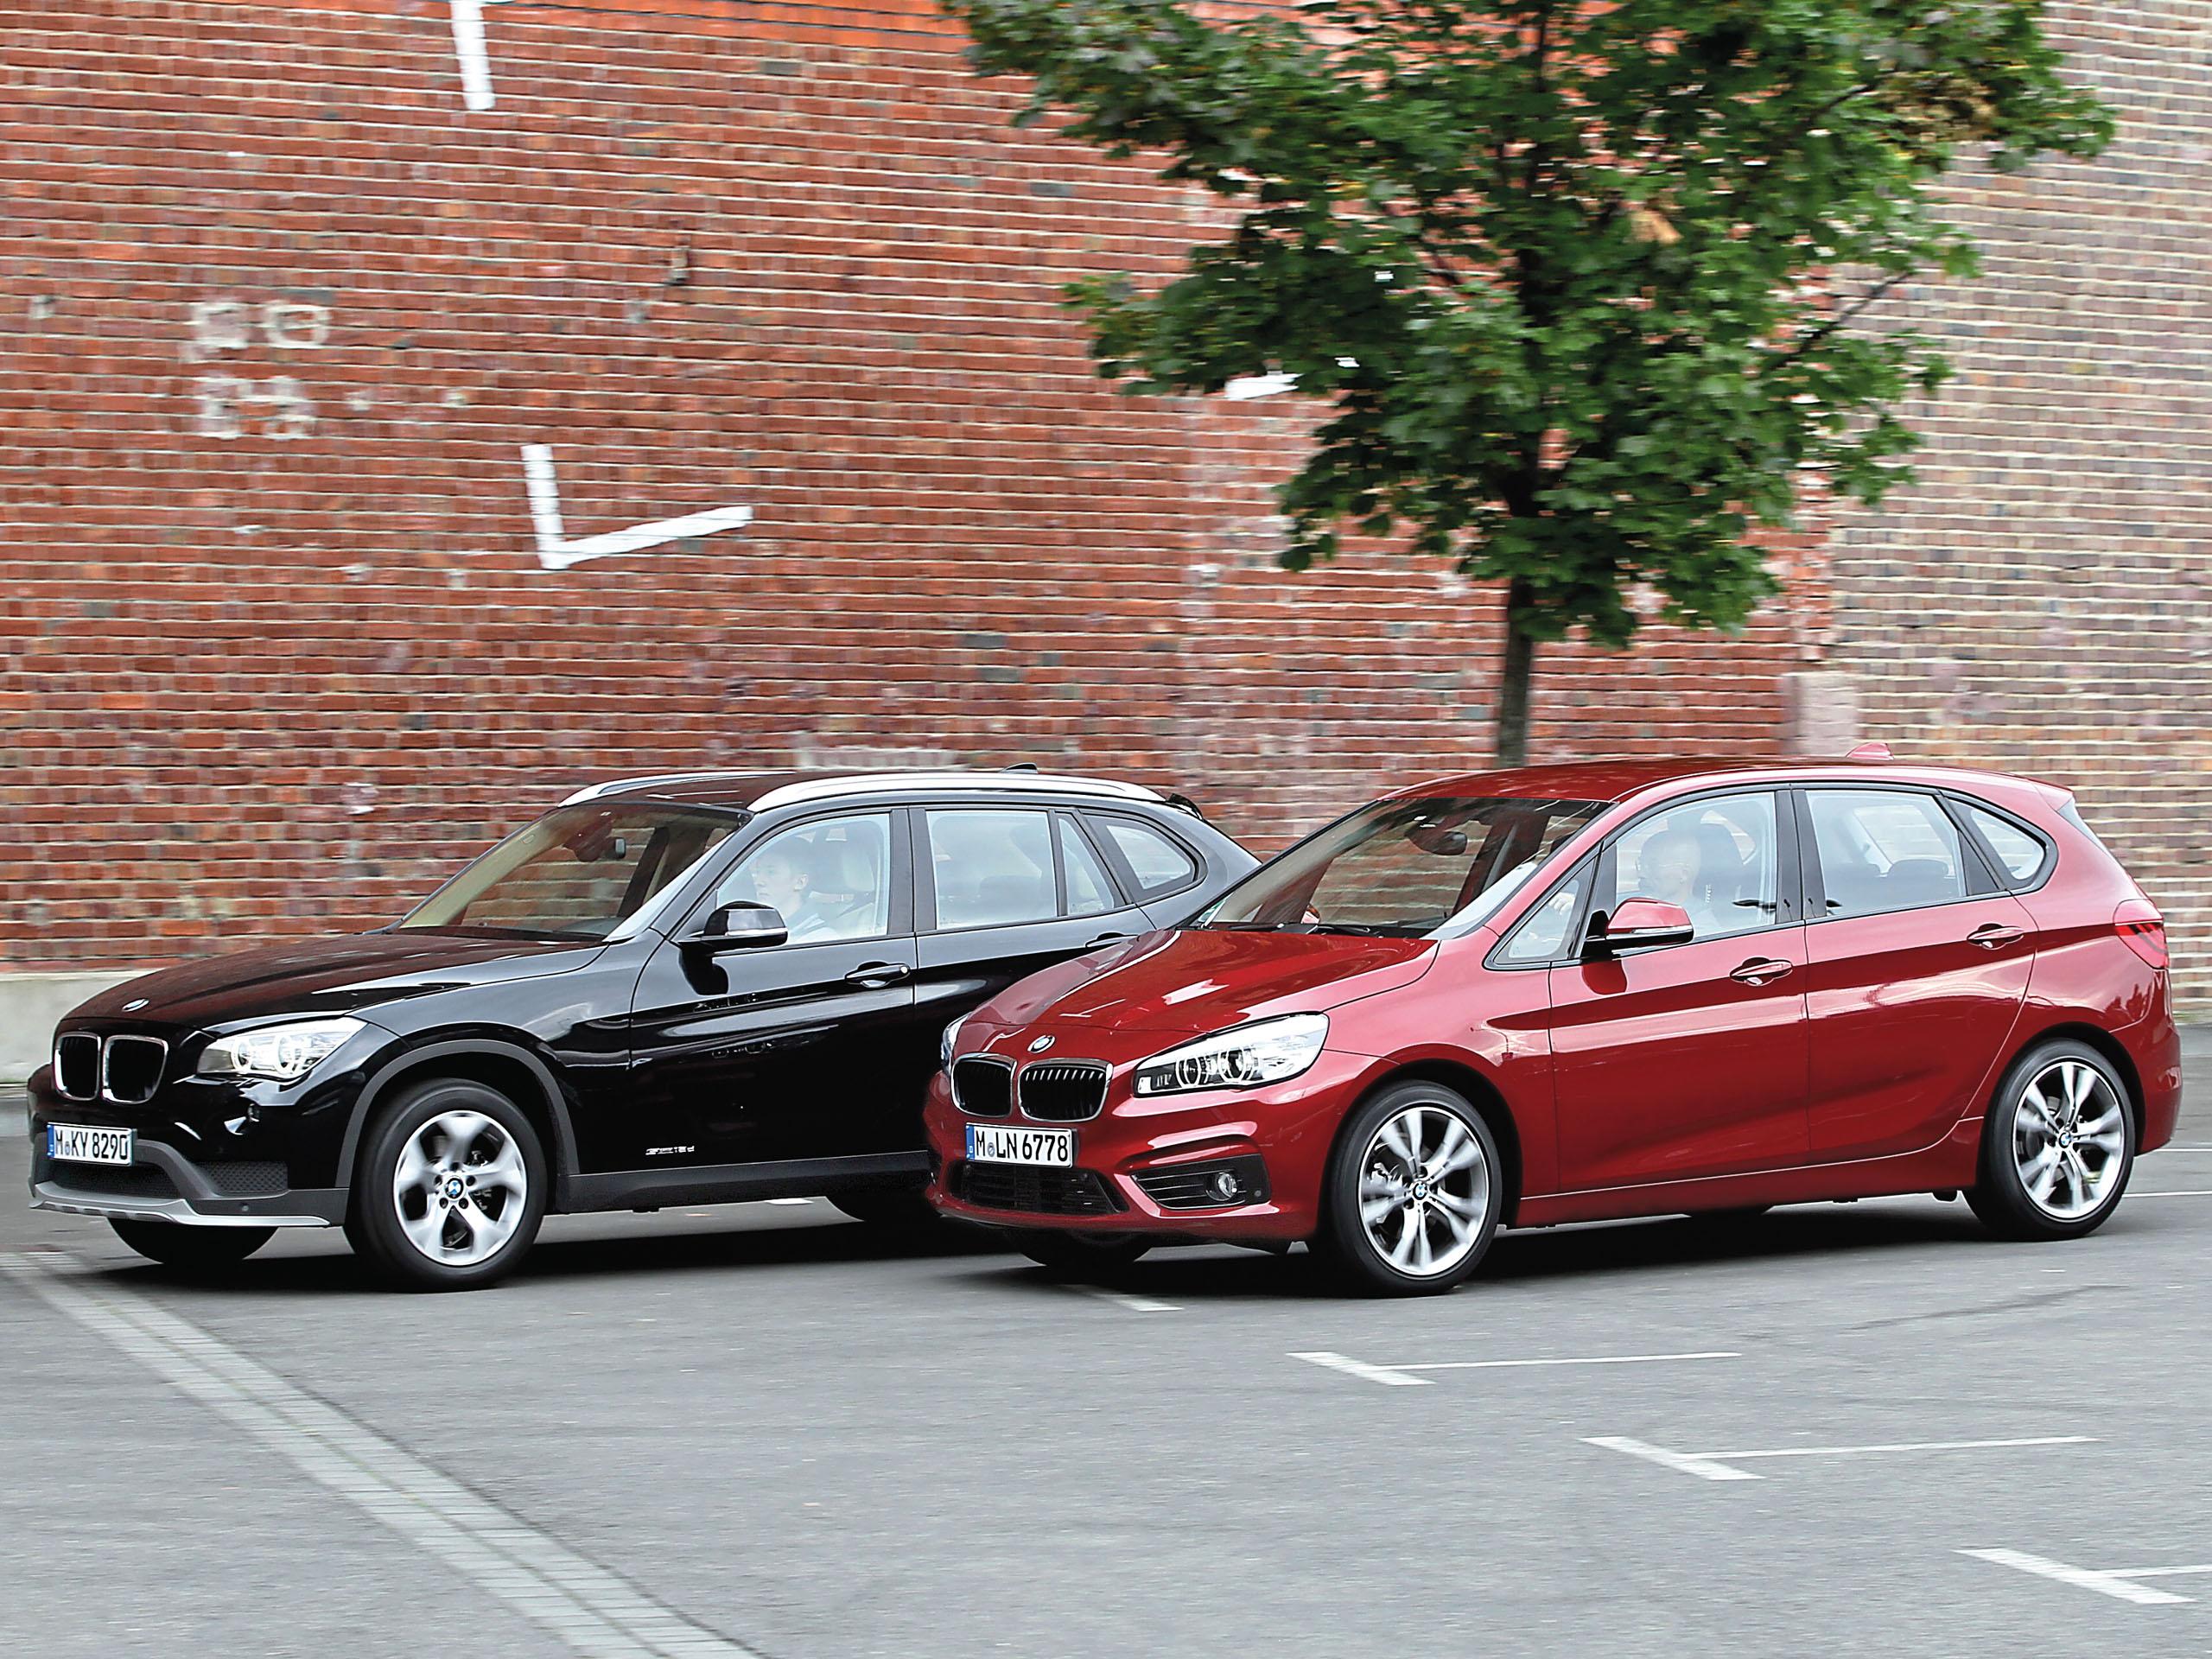 Vergleichstest BMW 2er Active Tourer gegen BMW X1 sDrive18d